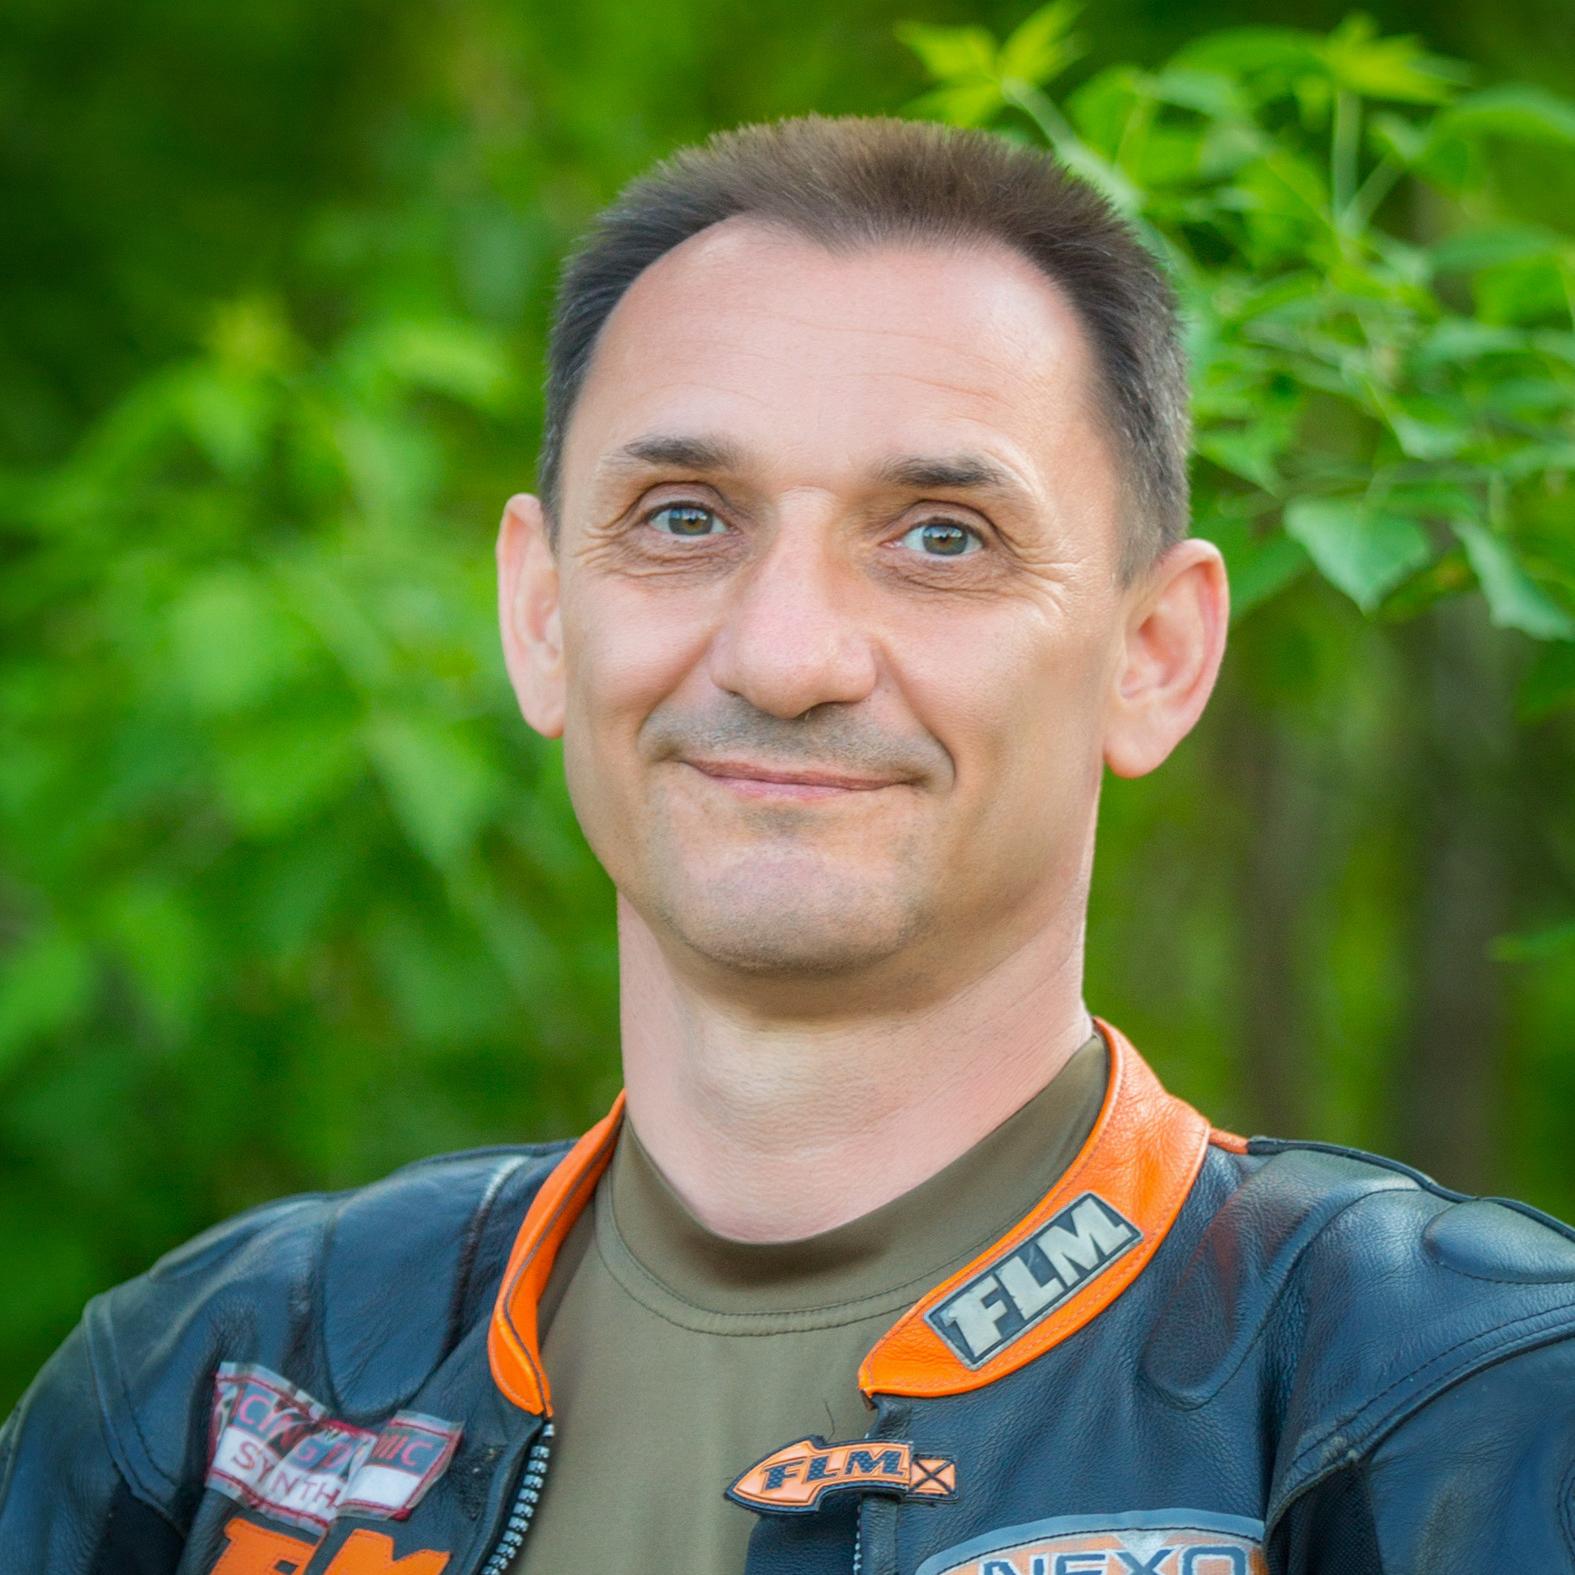 Малков Сергей Иванович